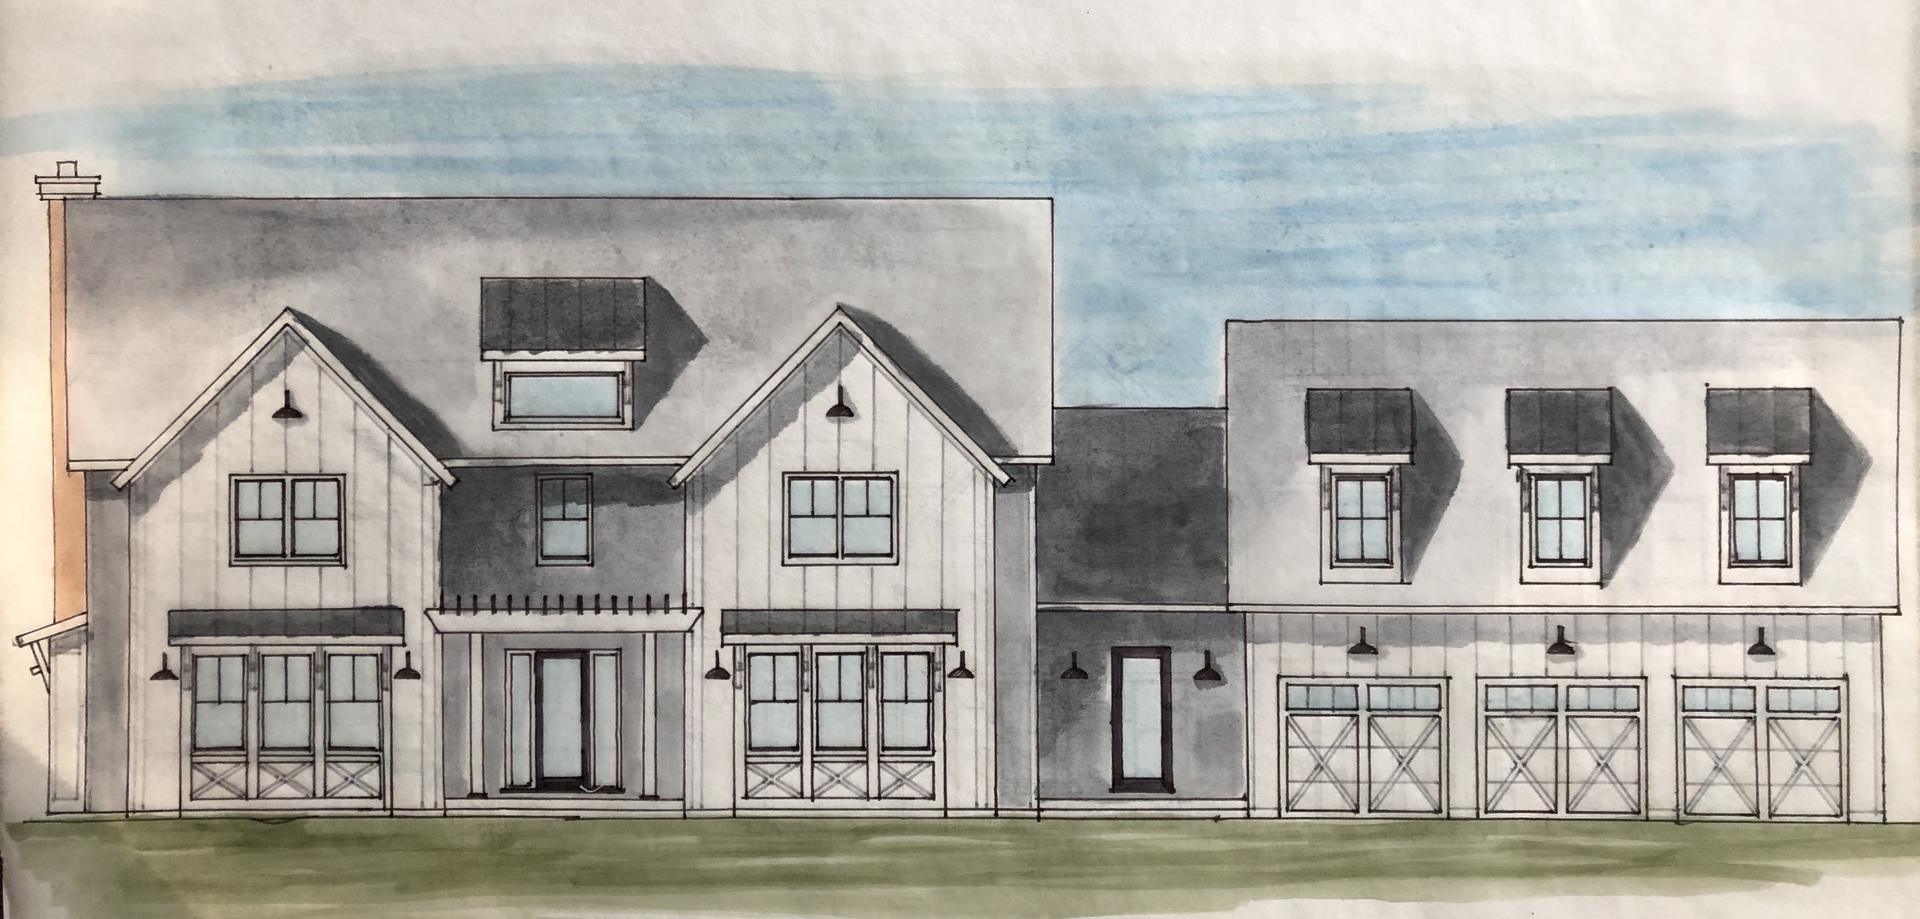 670 Princeton Avenue, South Barrington, Illinois 5 Bedroom as one of Homes & Land Real Estate